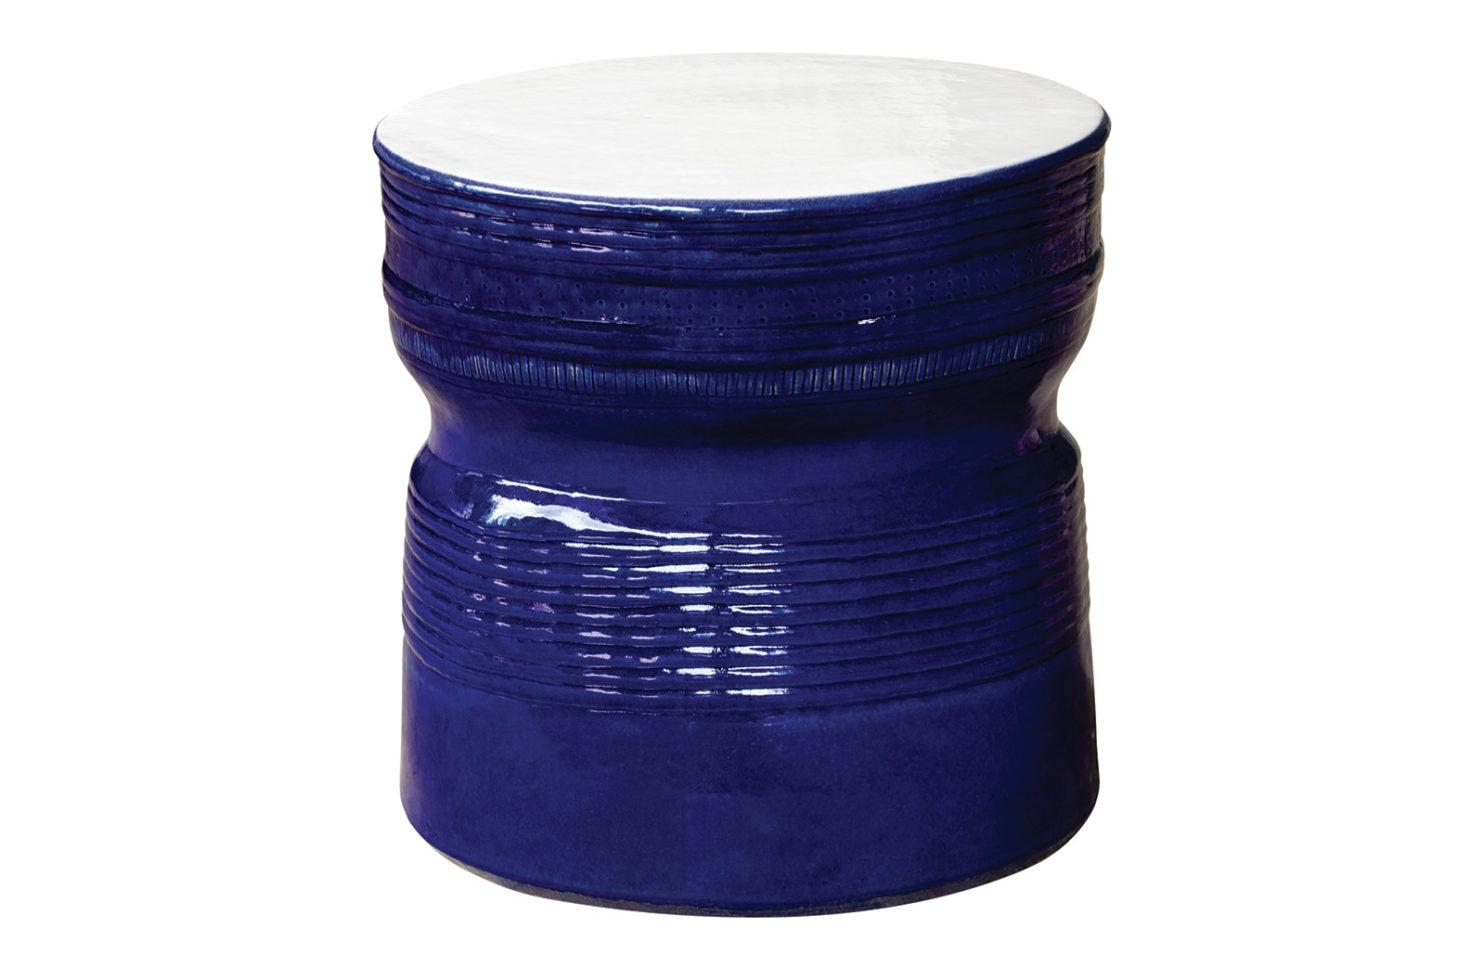 Ceramic ancaris table 308FT225P2SWNB